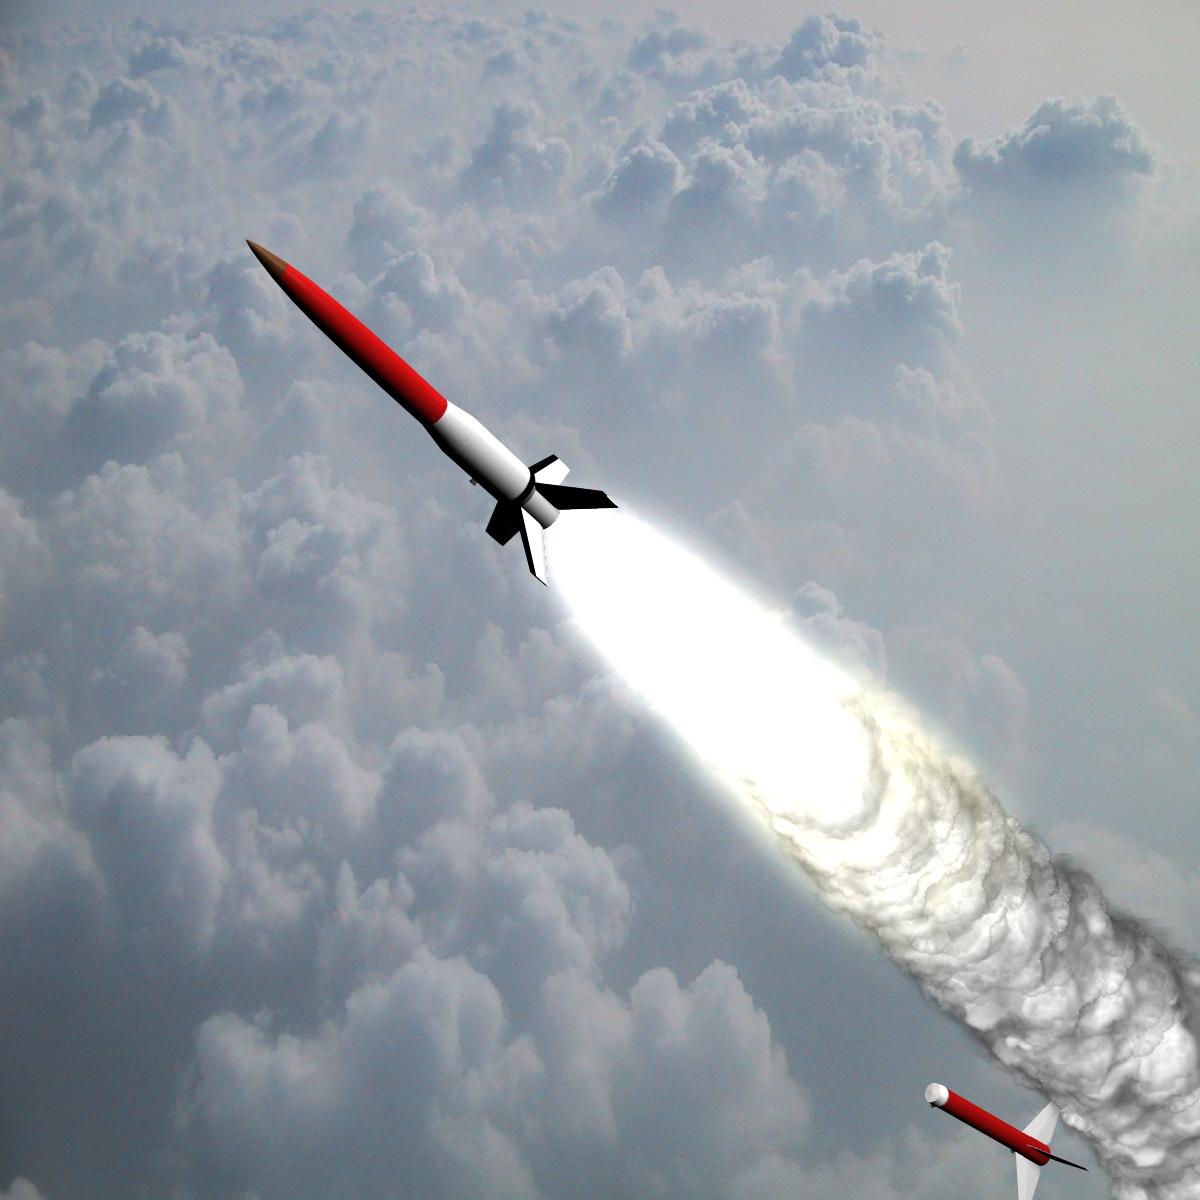 Astrobee 200 Rocket 3d model 3ds dxf fbx blend cob dae X   obj 165942